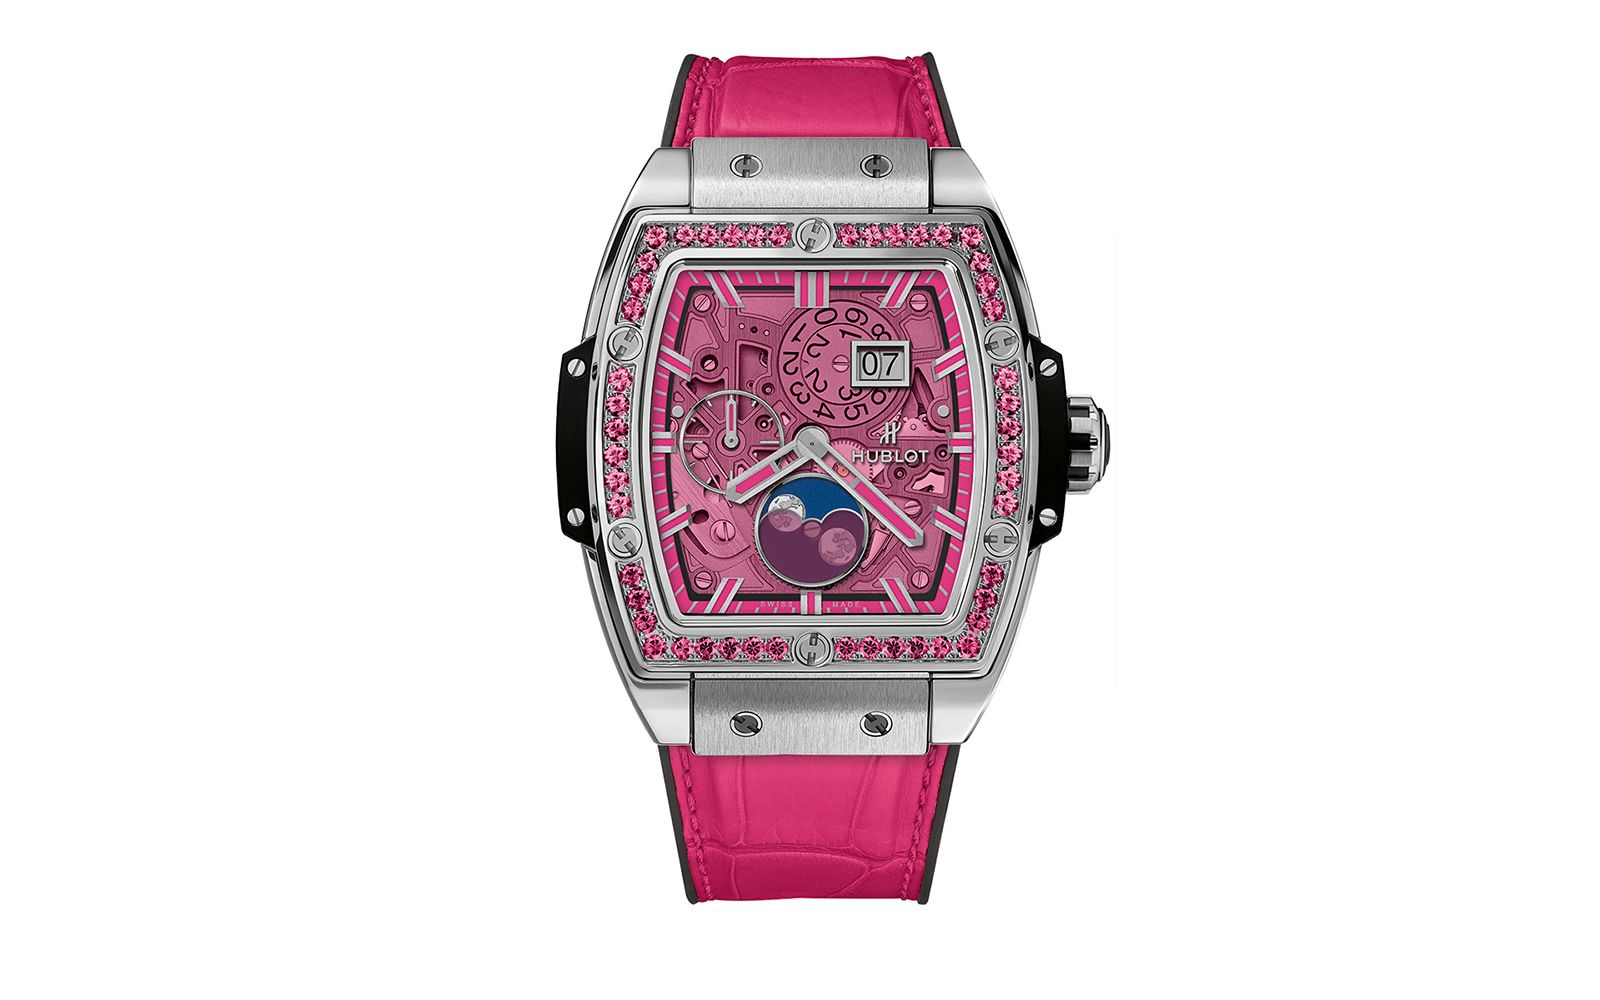 Hublot Spirit of Big Bang Moonphase in Titanium Pink (Photo: Courtesy of Hublot)